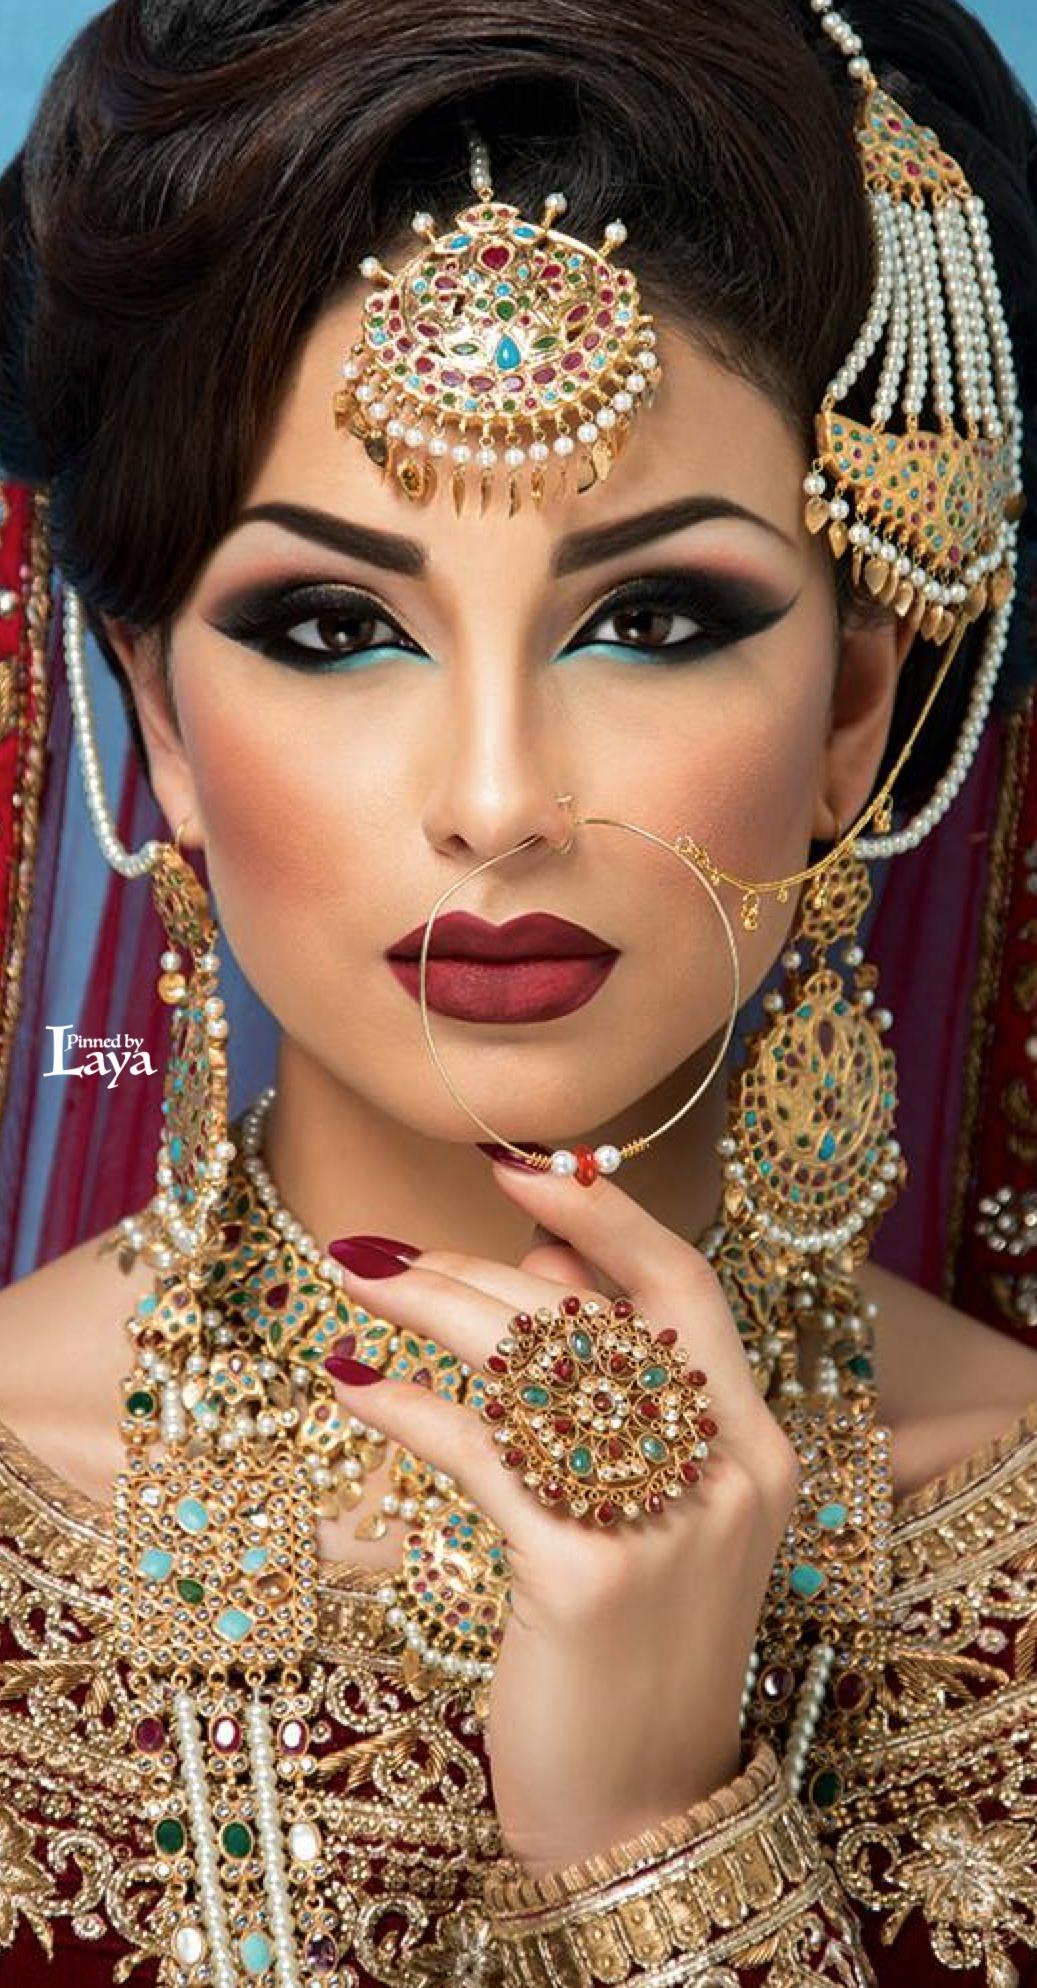 Pin By Label Shrena Hirawat On Beauty, Hair, Makeup | Indian Bridal regarding Bridal Makeup Pictures Facebook